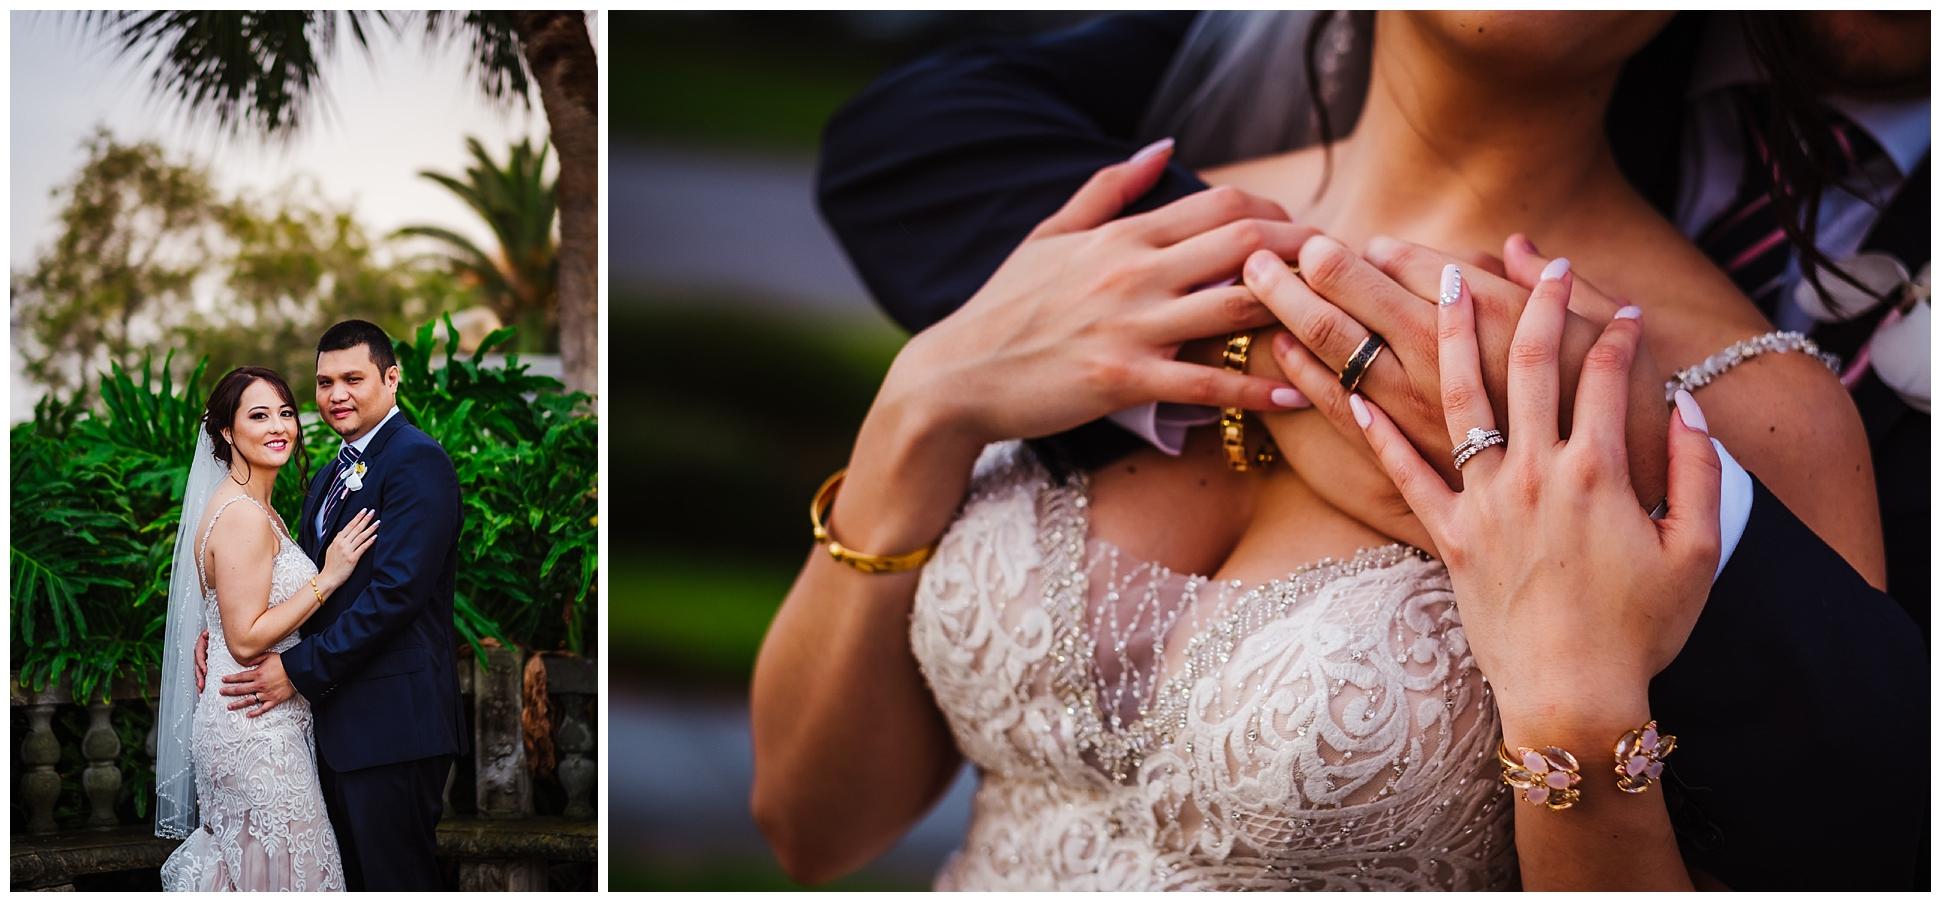 vinoy-sunset-ballroom-rainy-day-wedding-photography-orchids-trinidad-flawless-fetes-ashlee-hamon_0156.jpg